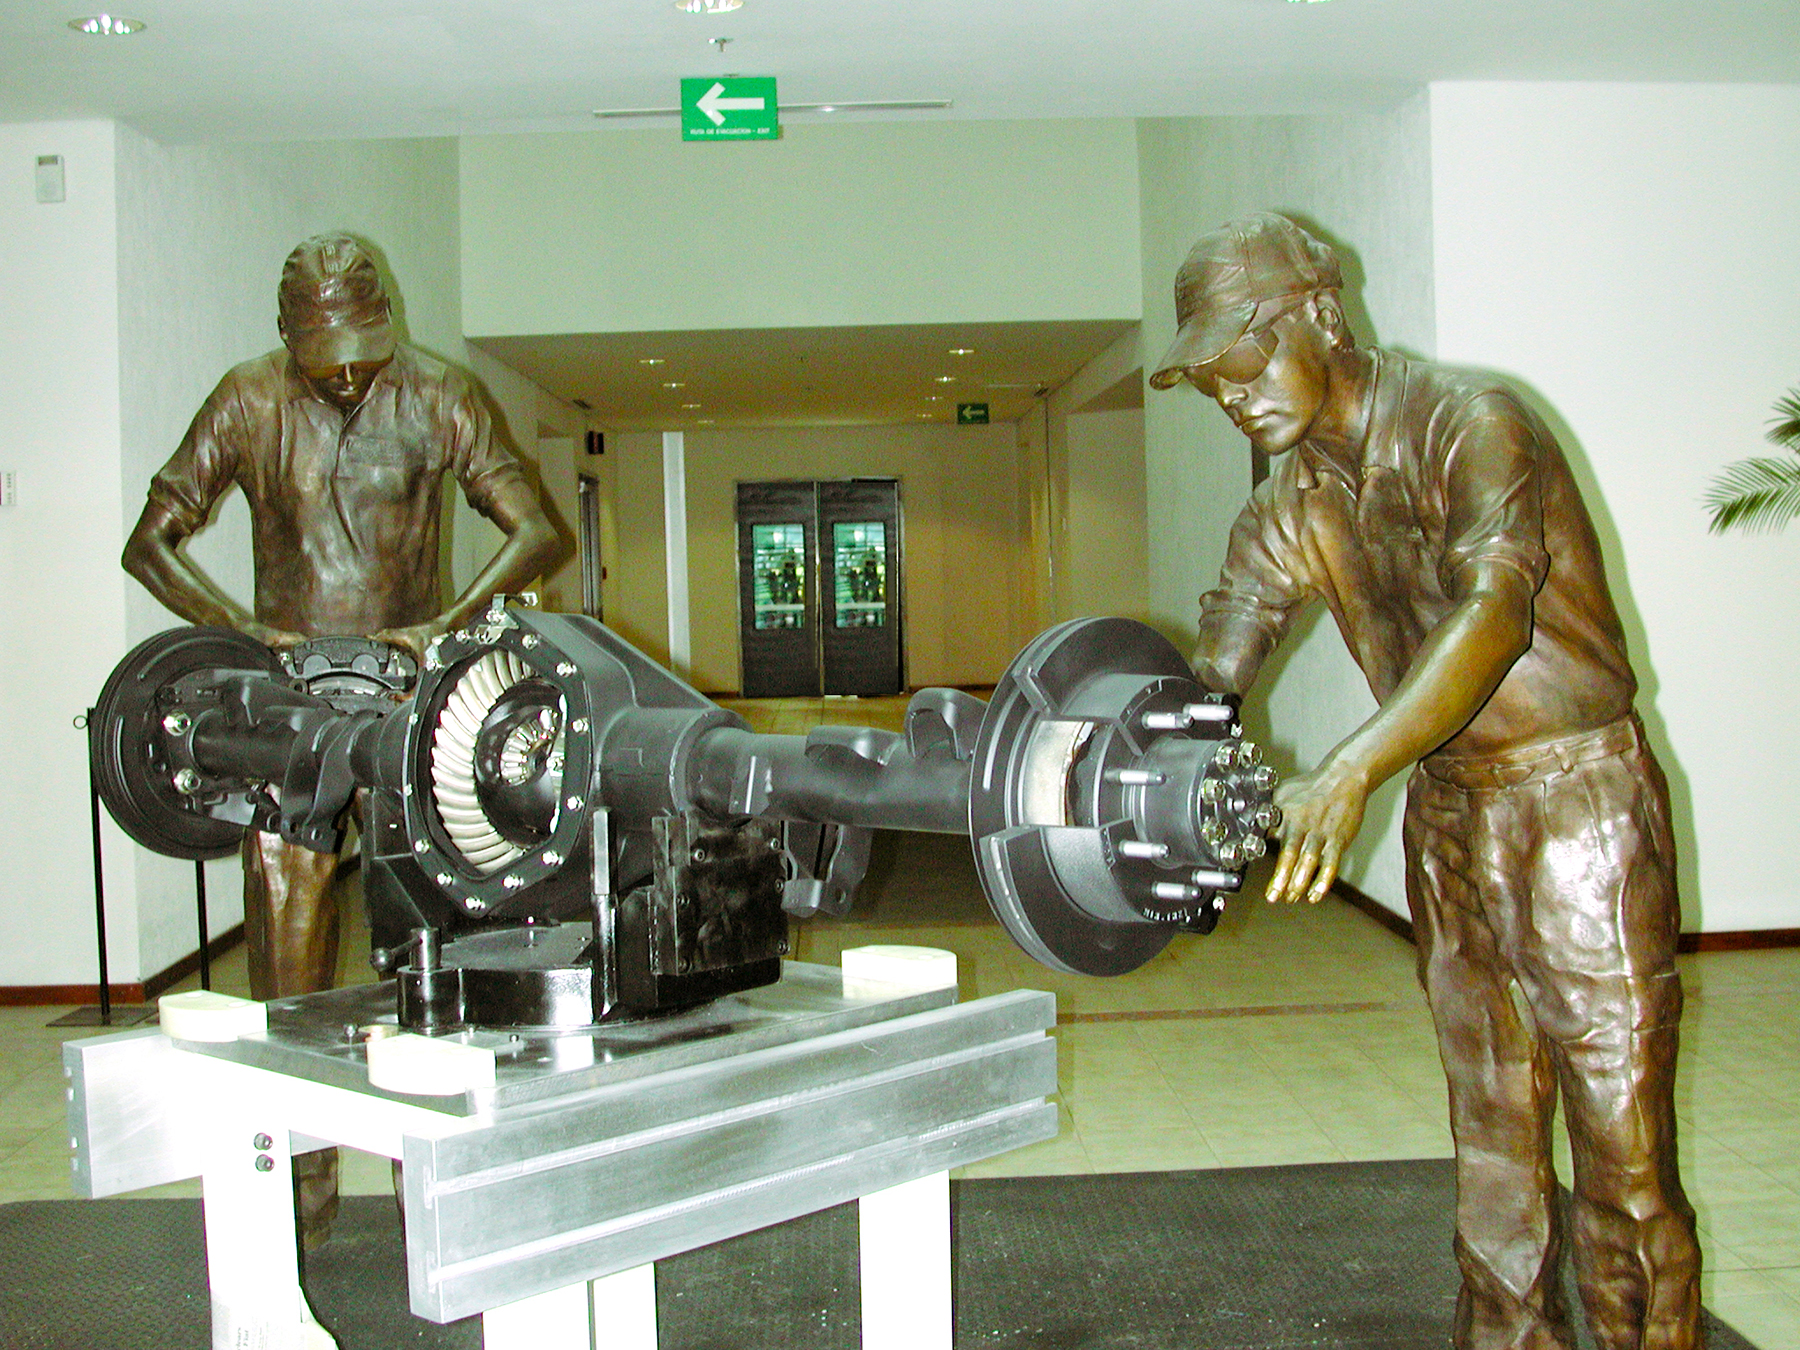 American Axle de Mexico -WORKER ASSOCIATES